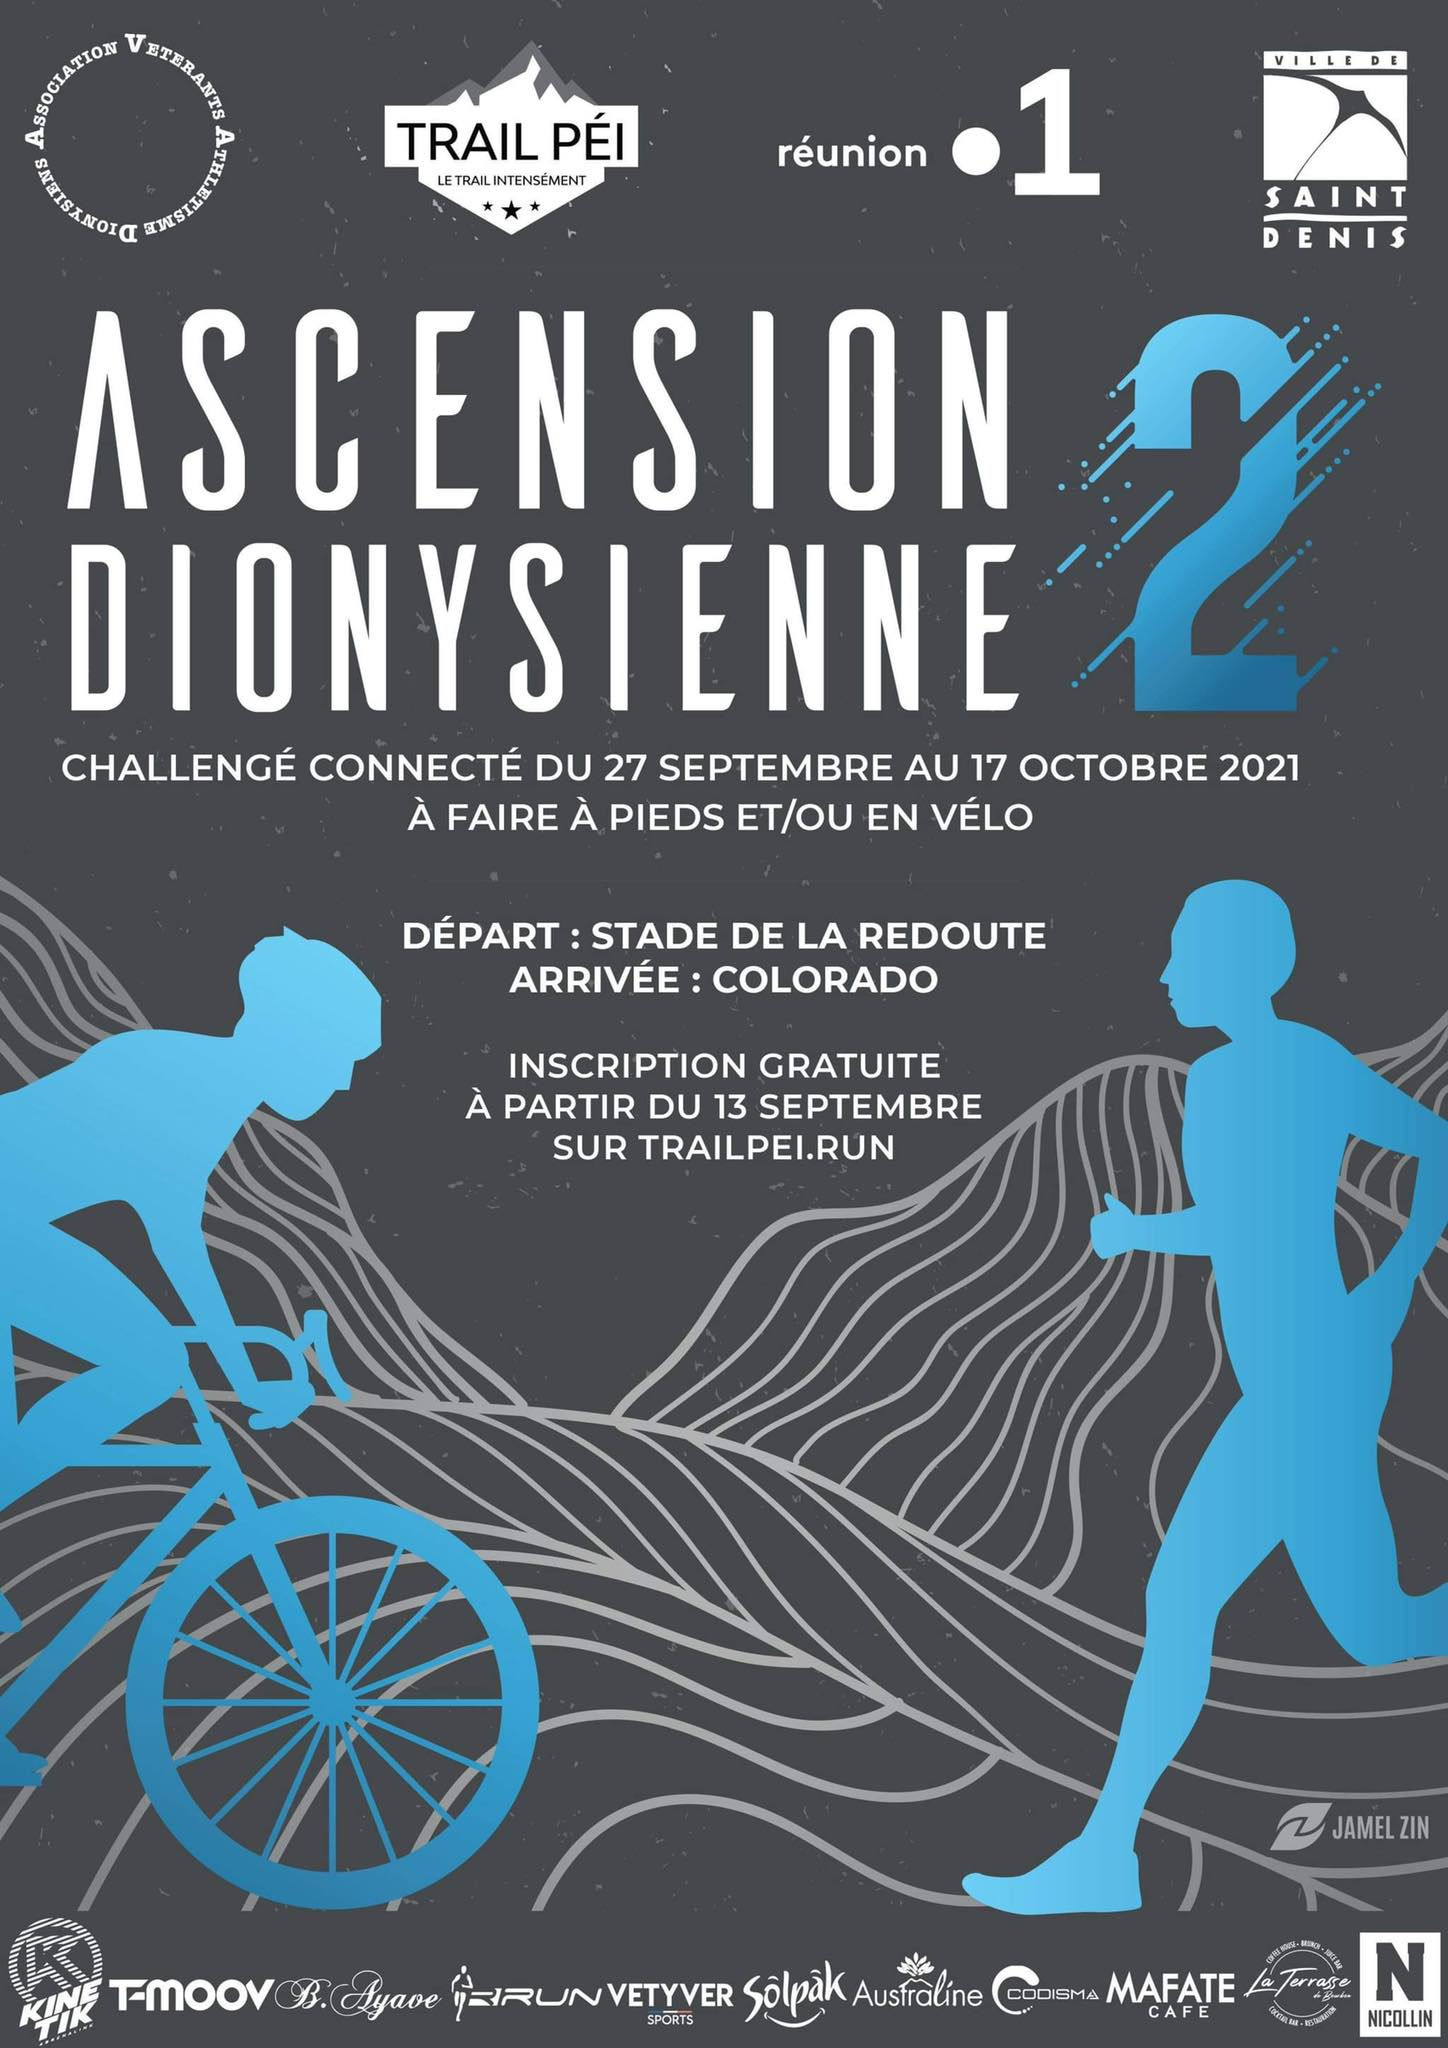 Affiche-Ascension-Dionysienne-2-TP